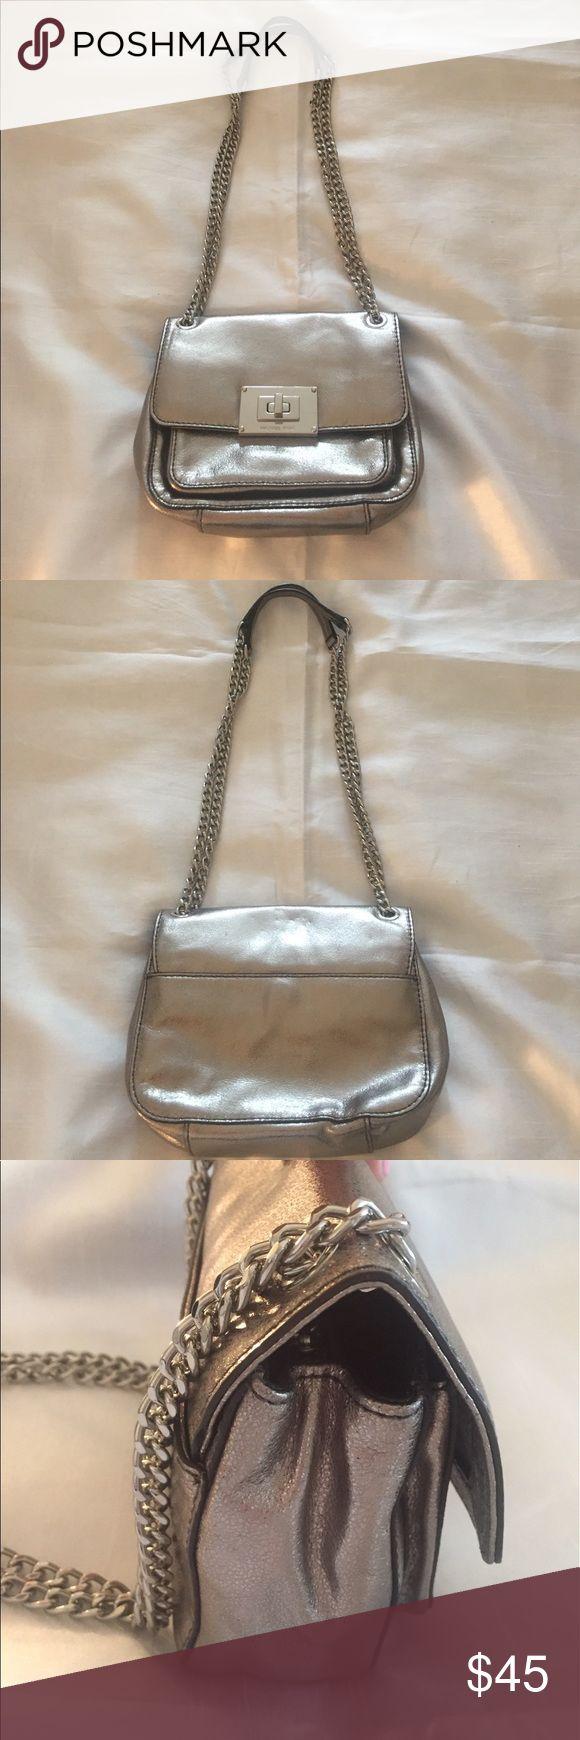 "Michael Kors Metallic Silver Shoulder Bag Like new! Used twice. Metallic silver chain (when worn as shoulder bag) measures 12.5"" in length. Body of bag measures almost 8"" long and 6"" high. Michael Kors Bags Mini Bags"